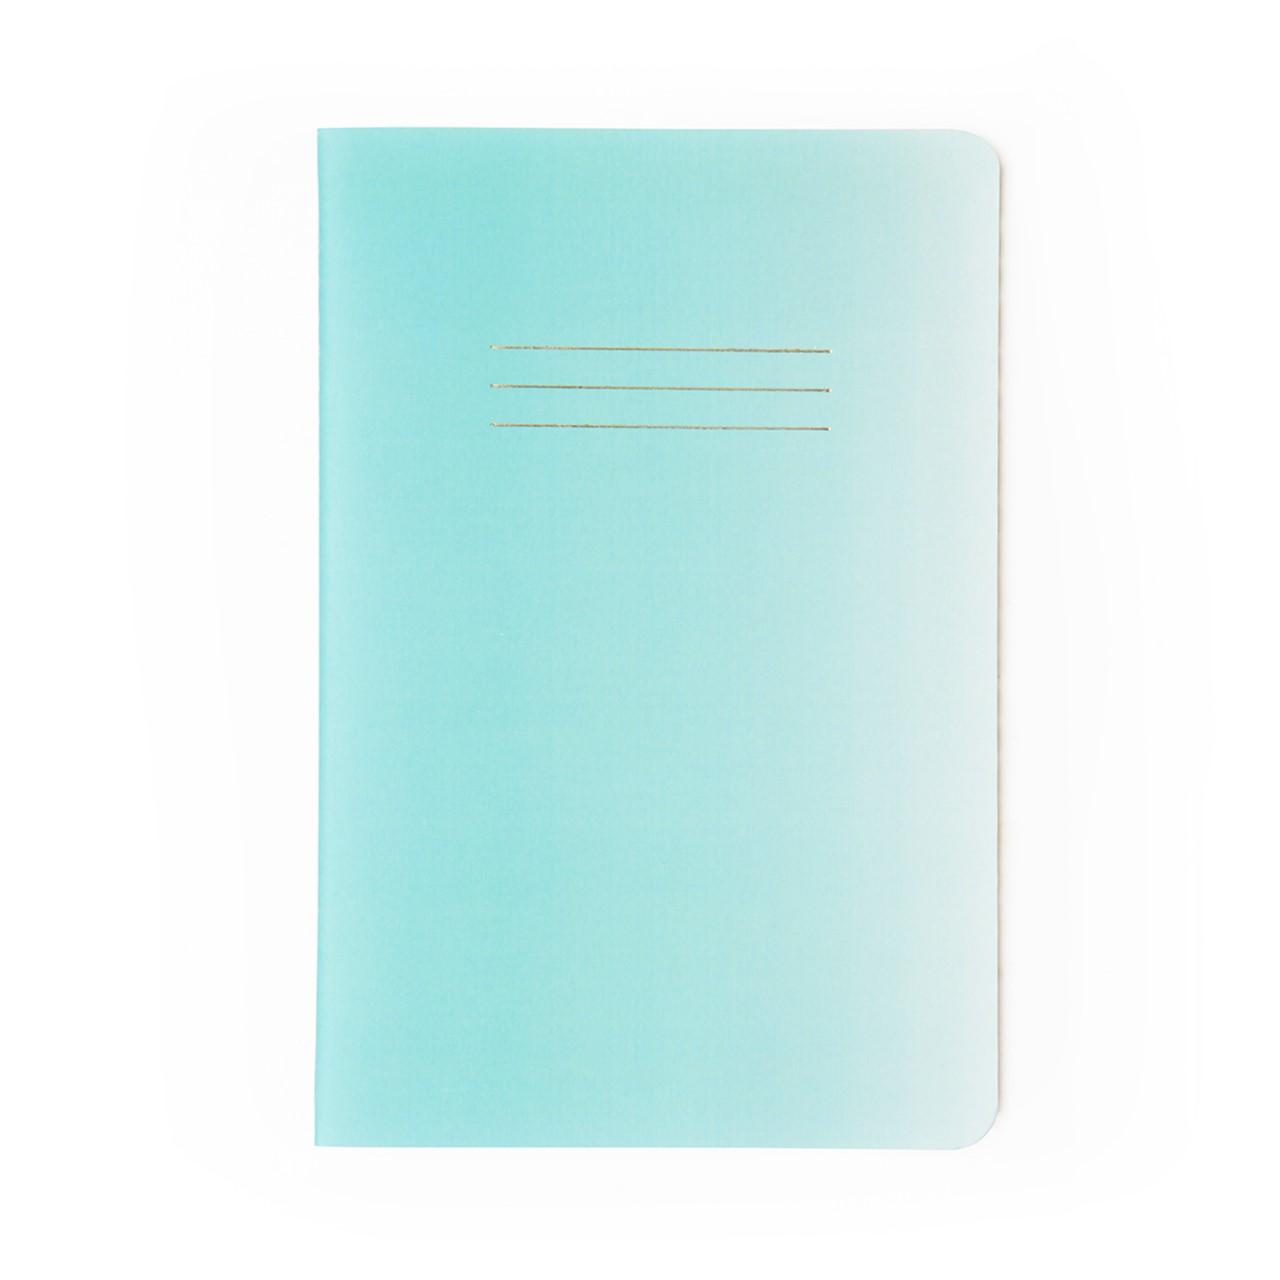 Caderneta Azul Pastel Degrade